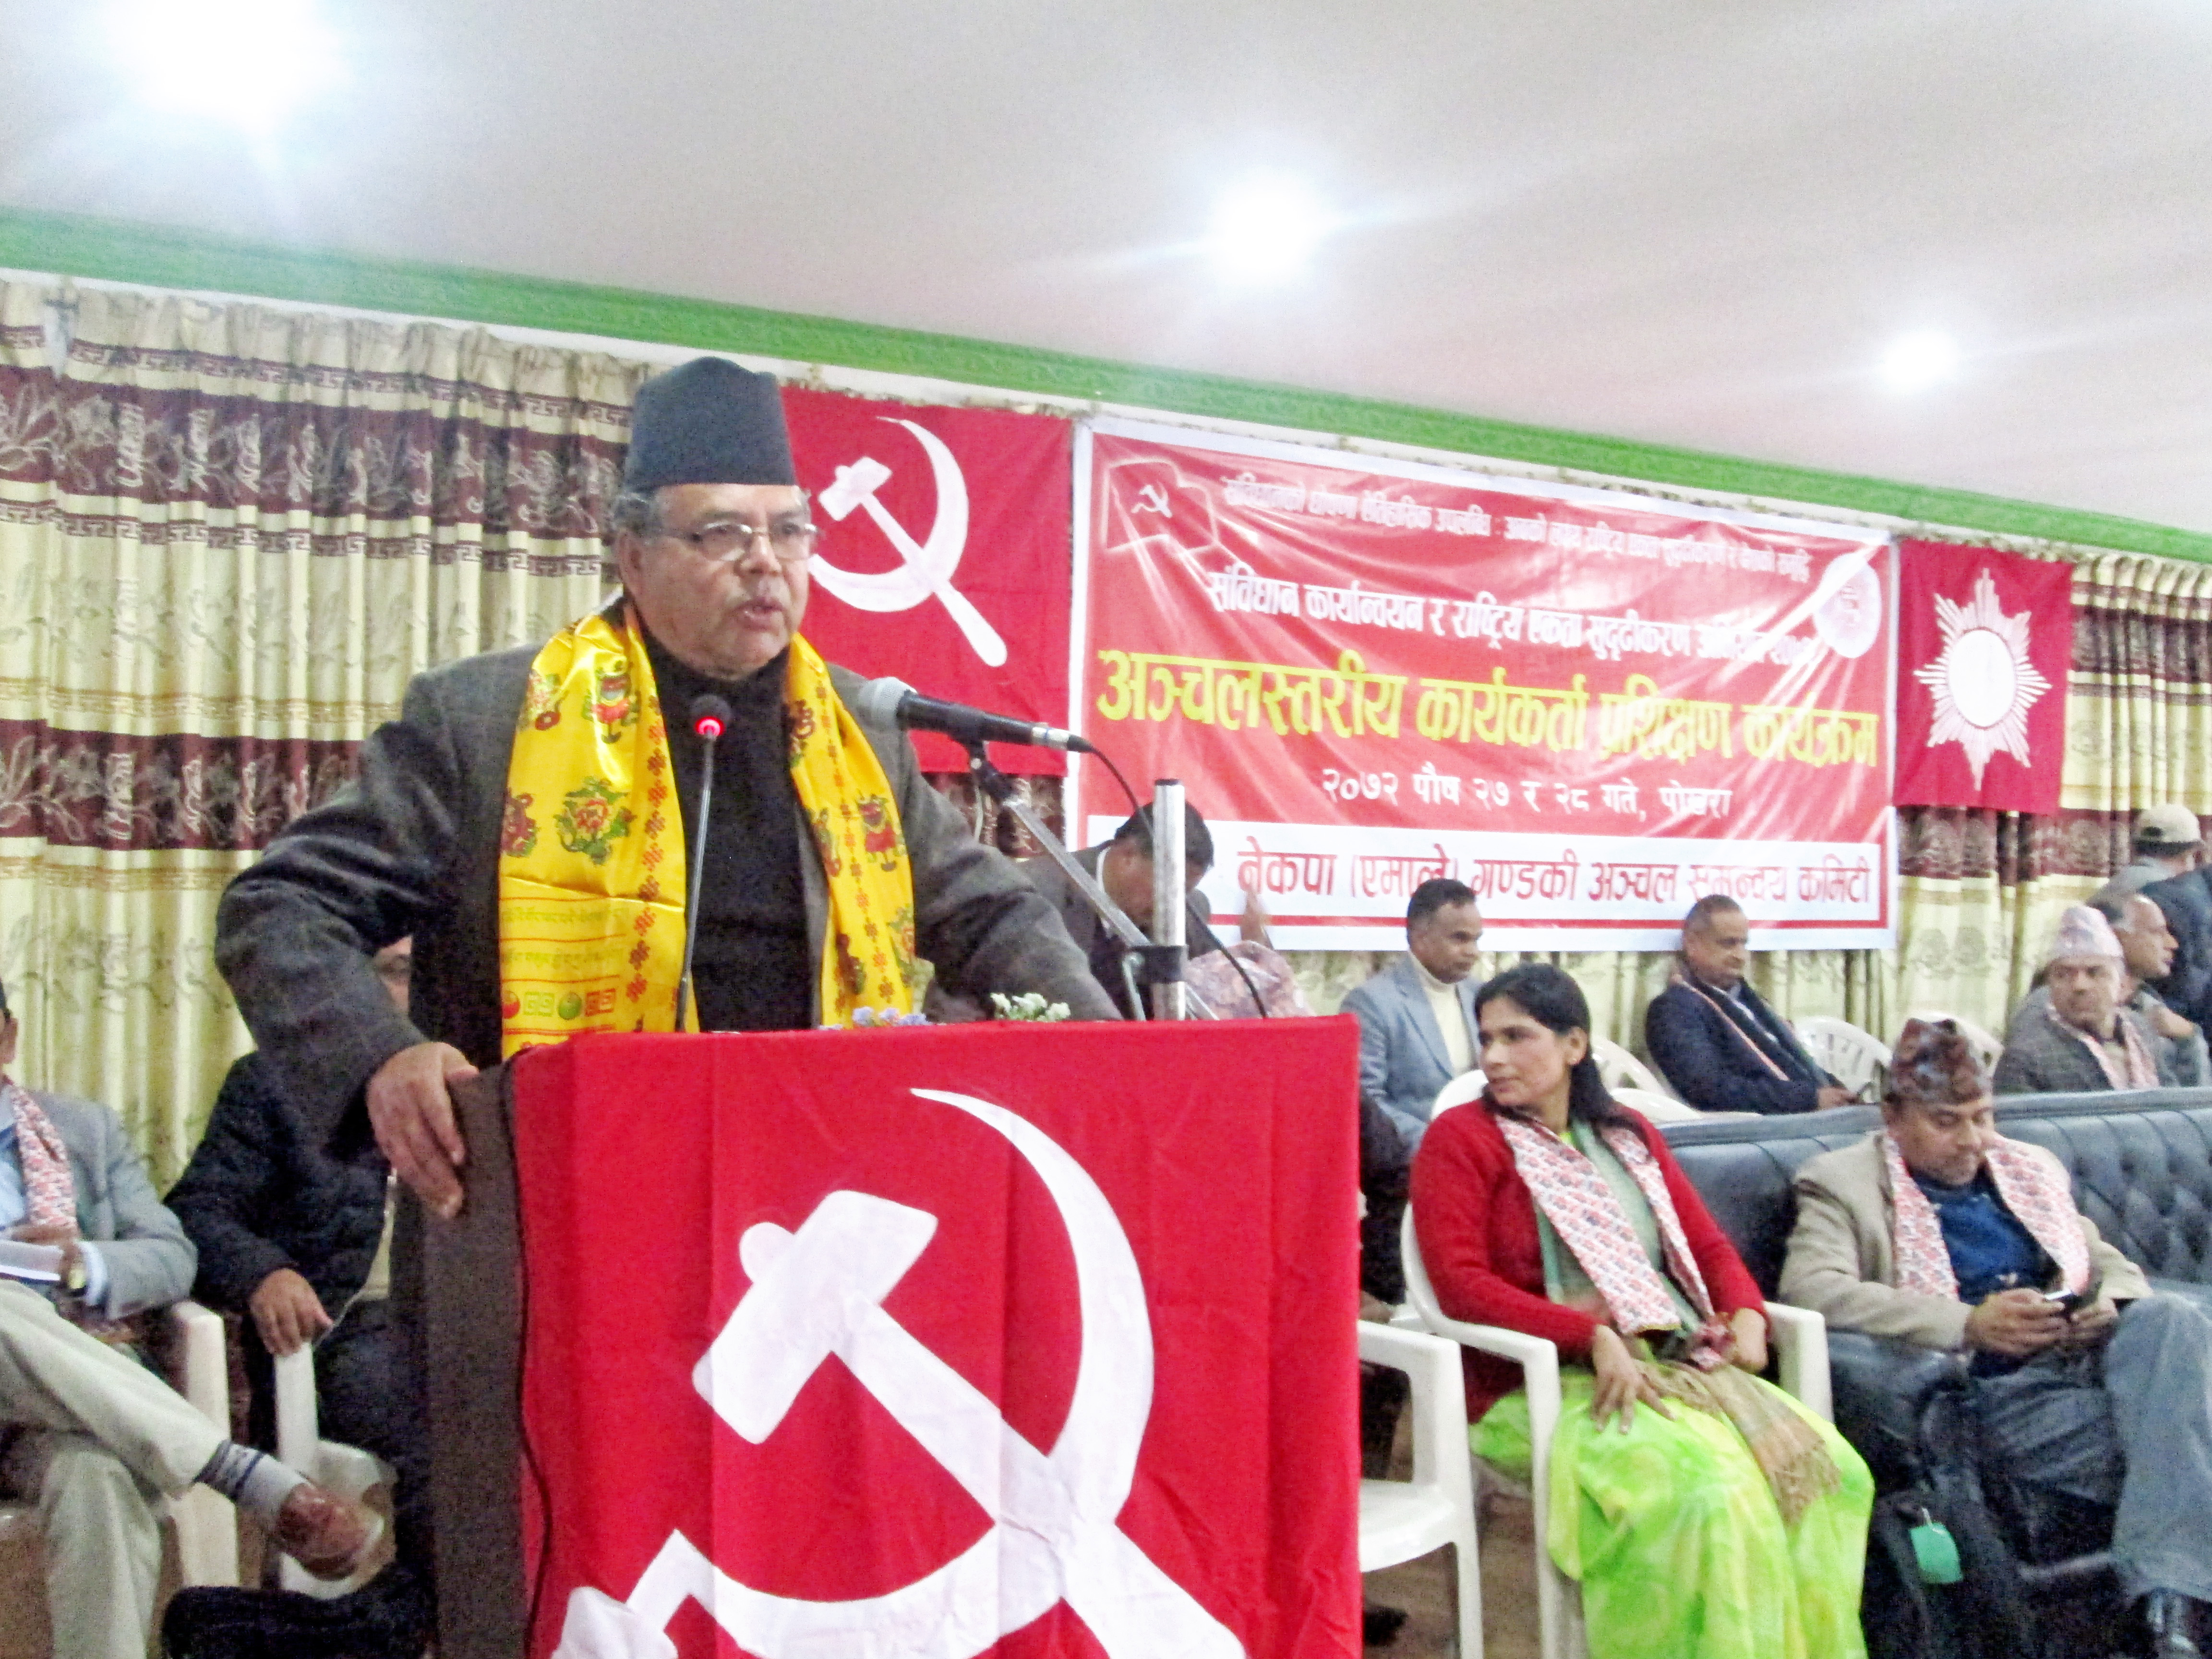 Former Prime Minister Jhalanath Khanal addressing CPN-UML Zonal Cadres Training Programme in Pokhara on Monday, January 11, 2016. Photo: Rishi Ram Baral